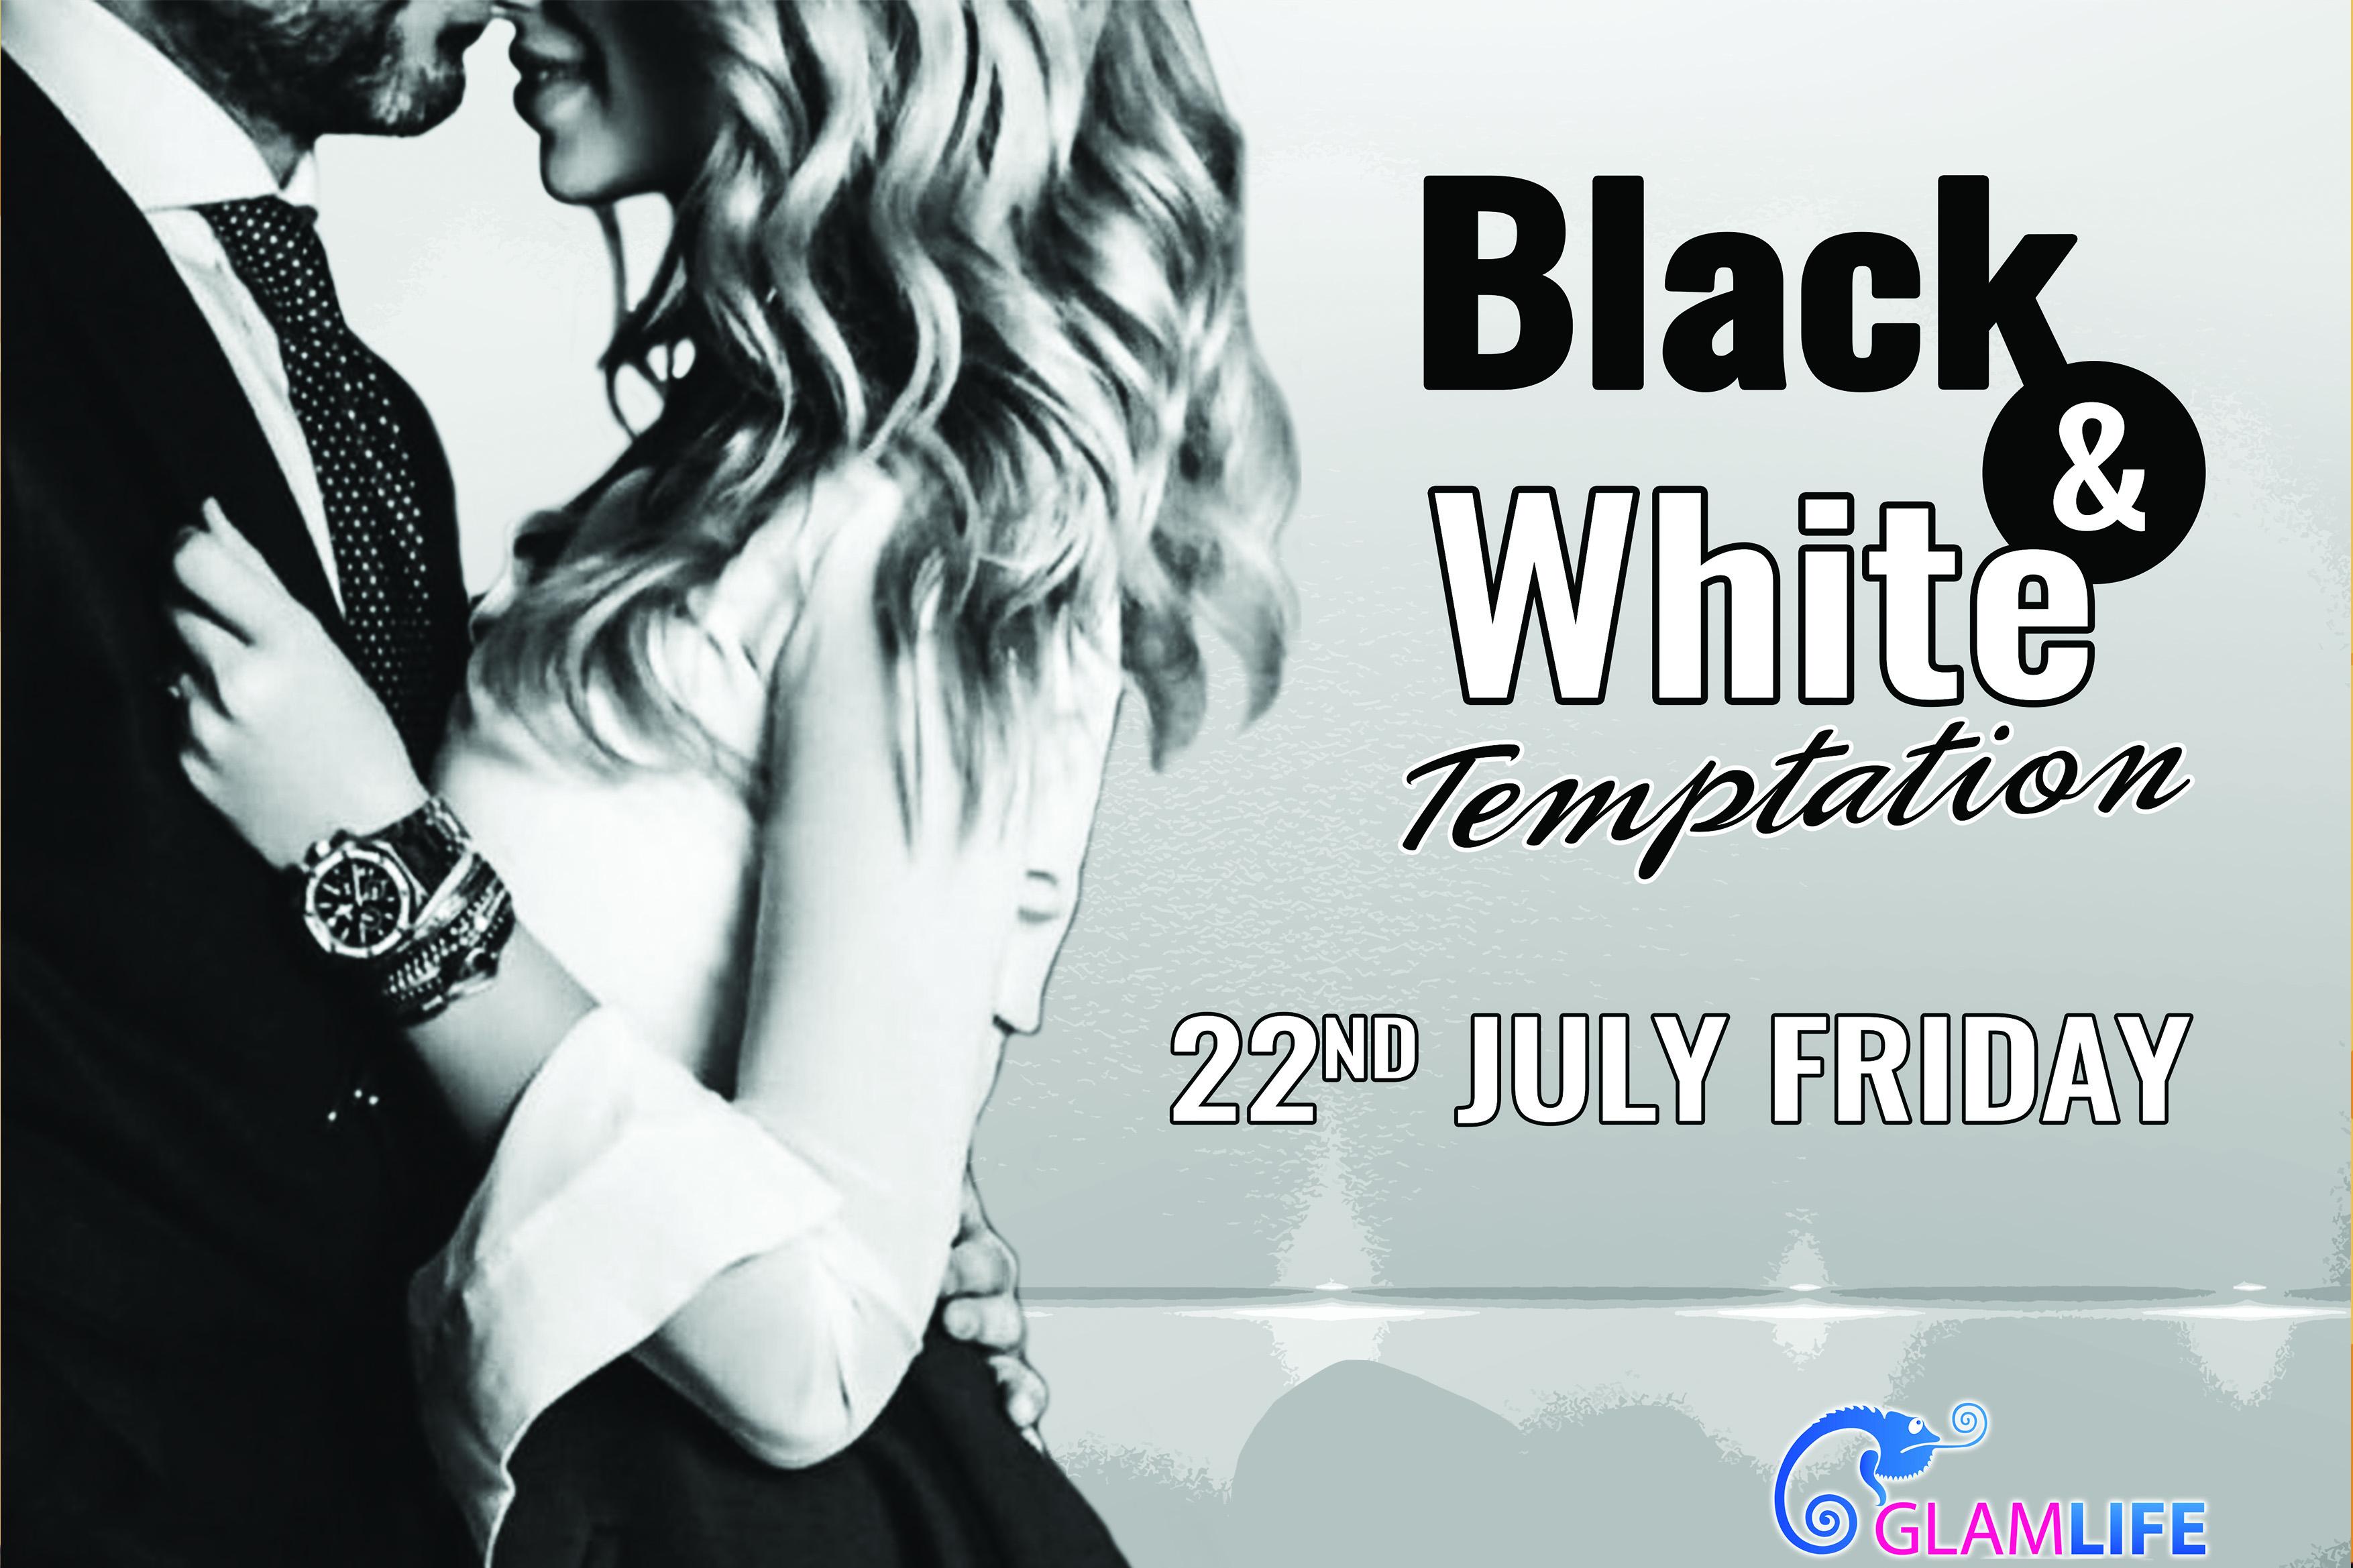 Black & White Temptation